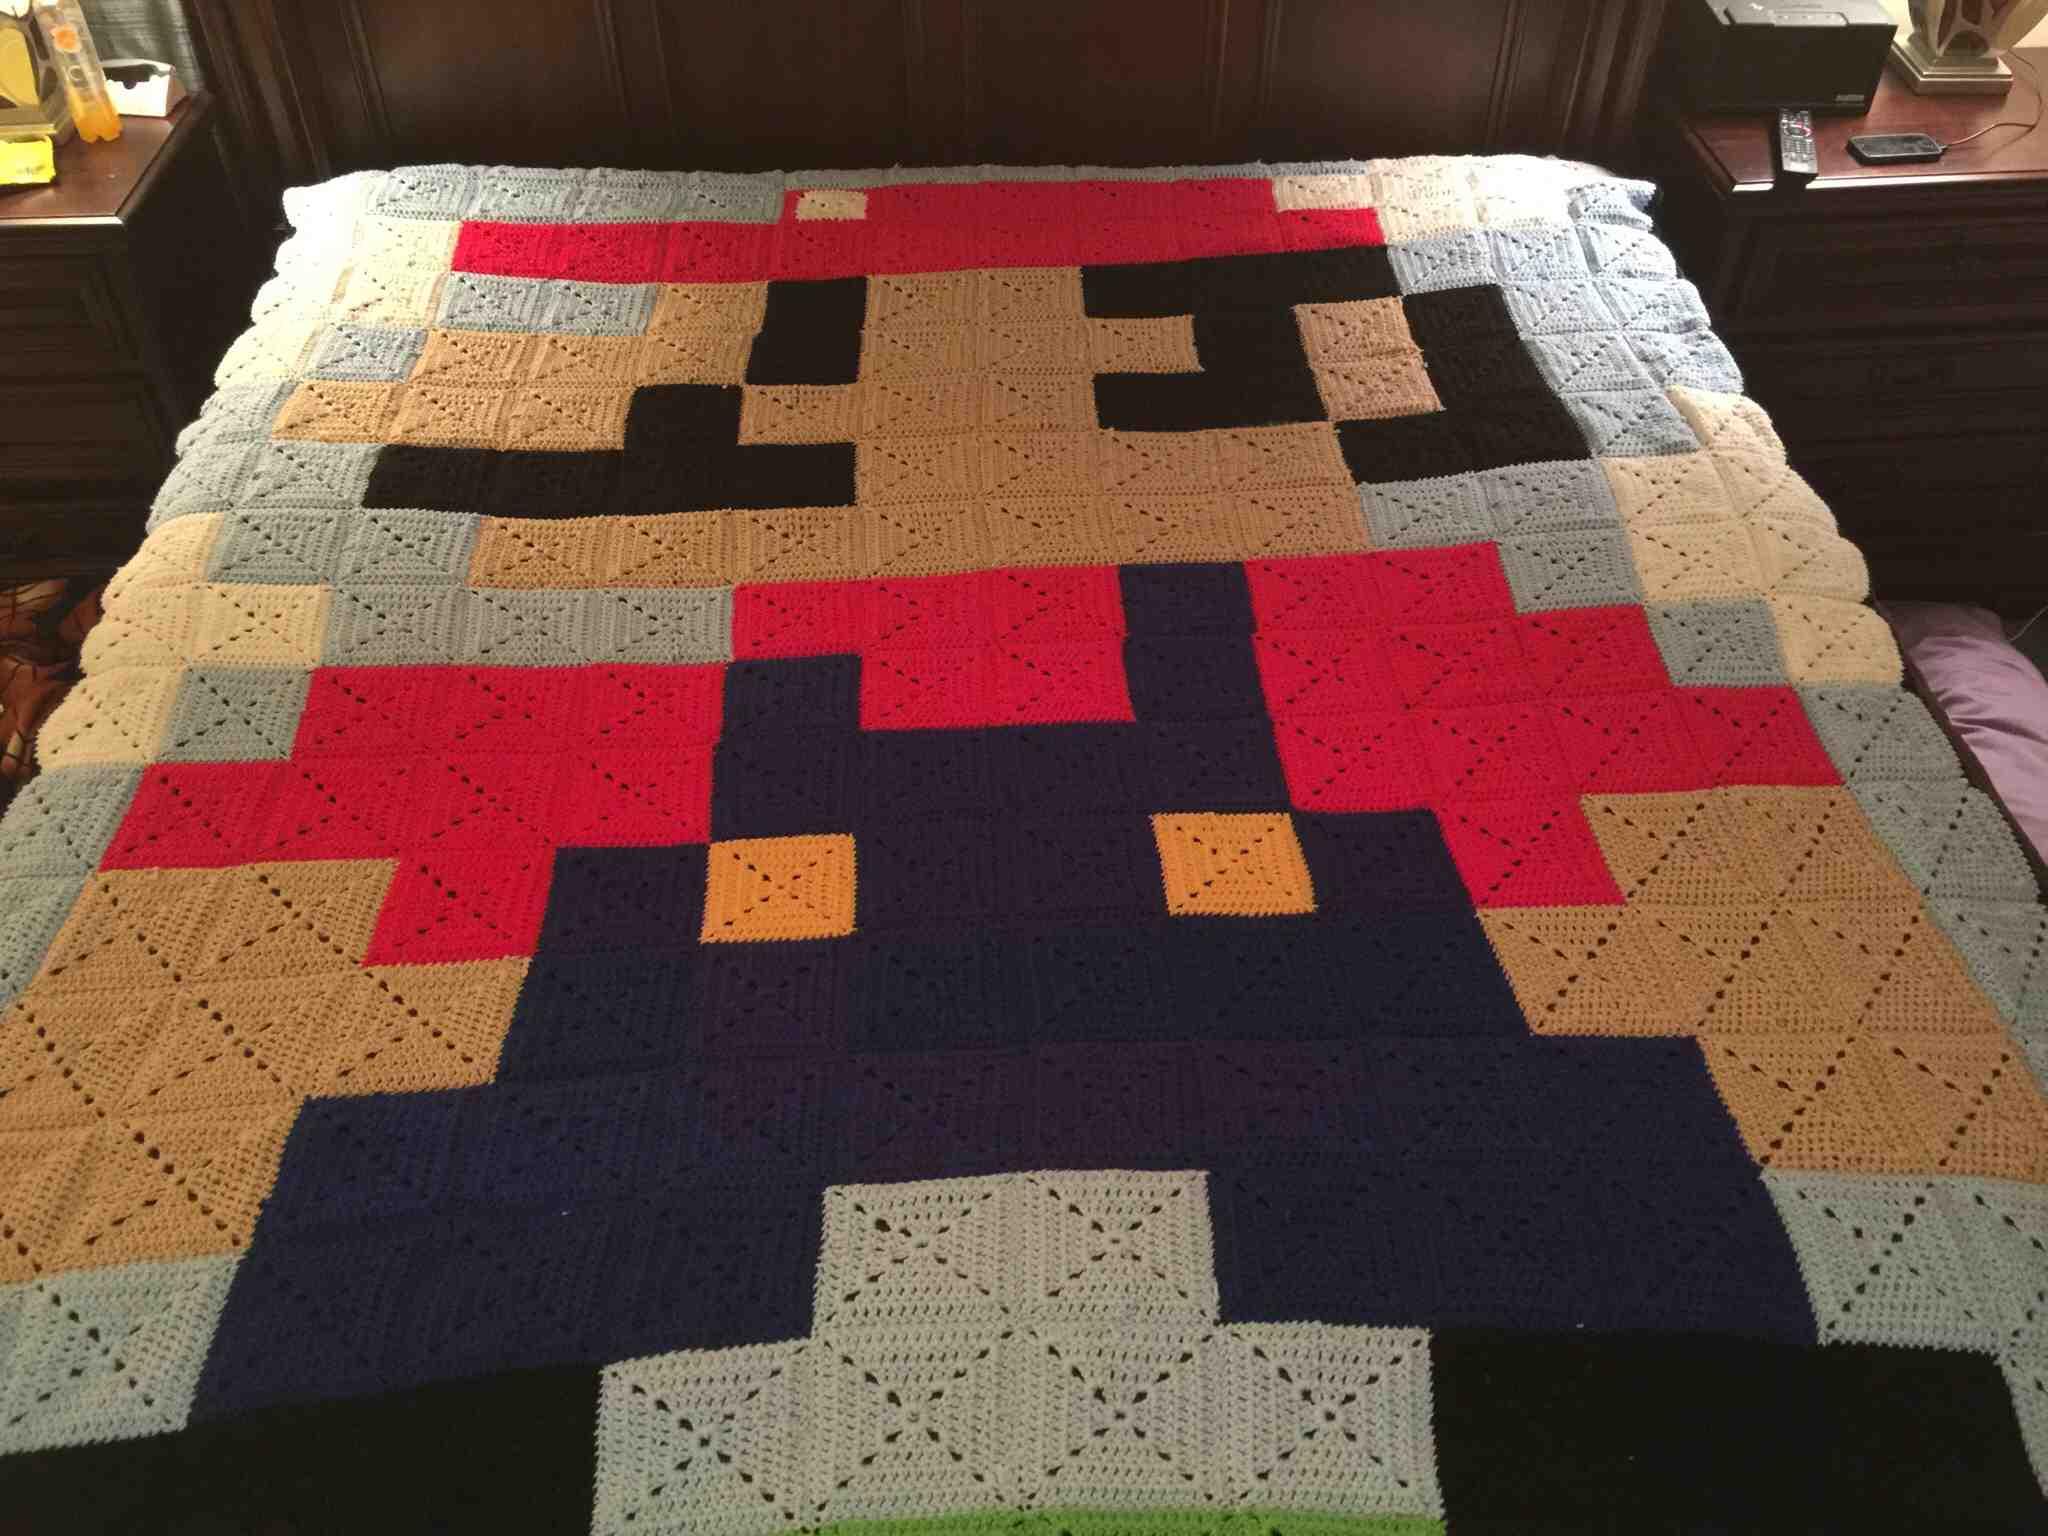 This IS Your Grandma's Super Mario Bros. Granny Square Blanket